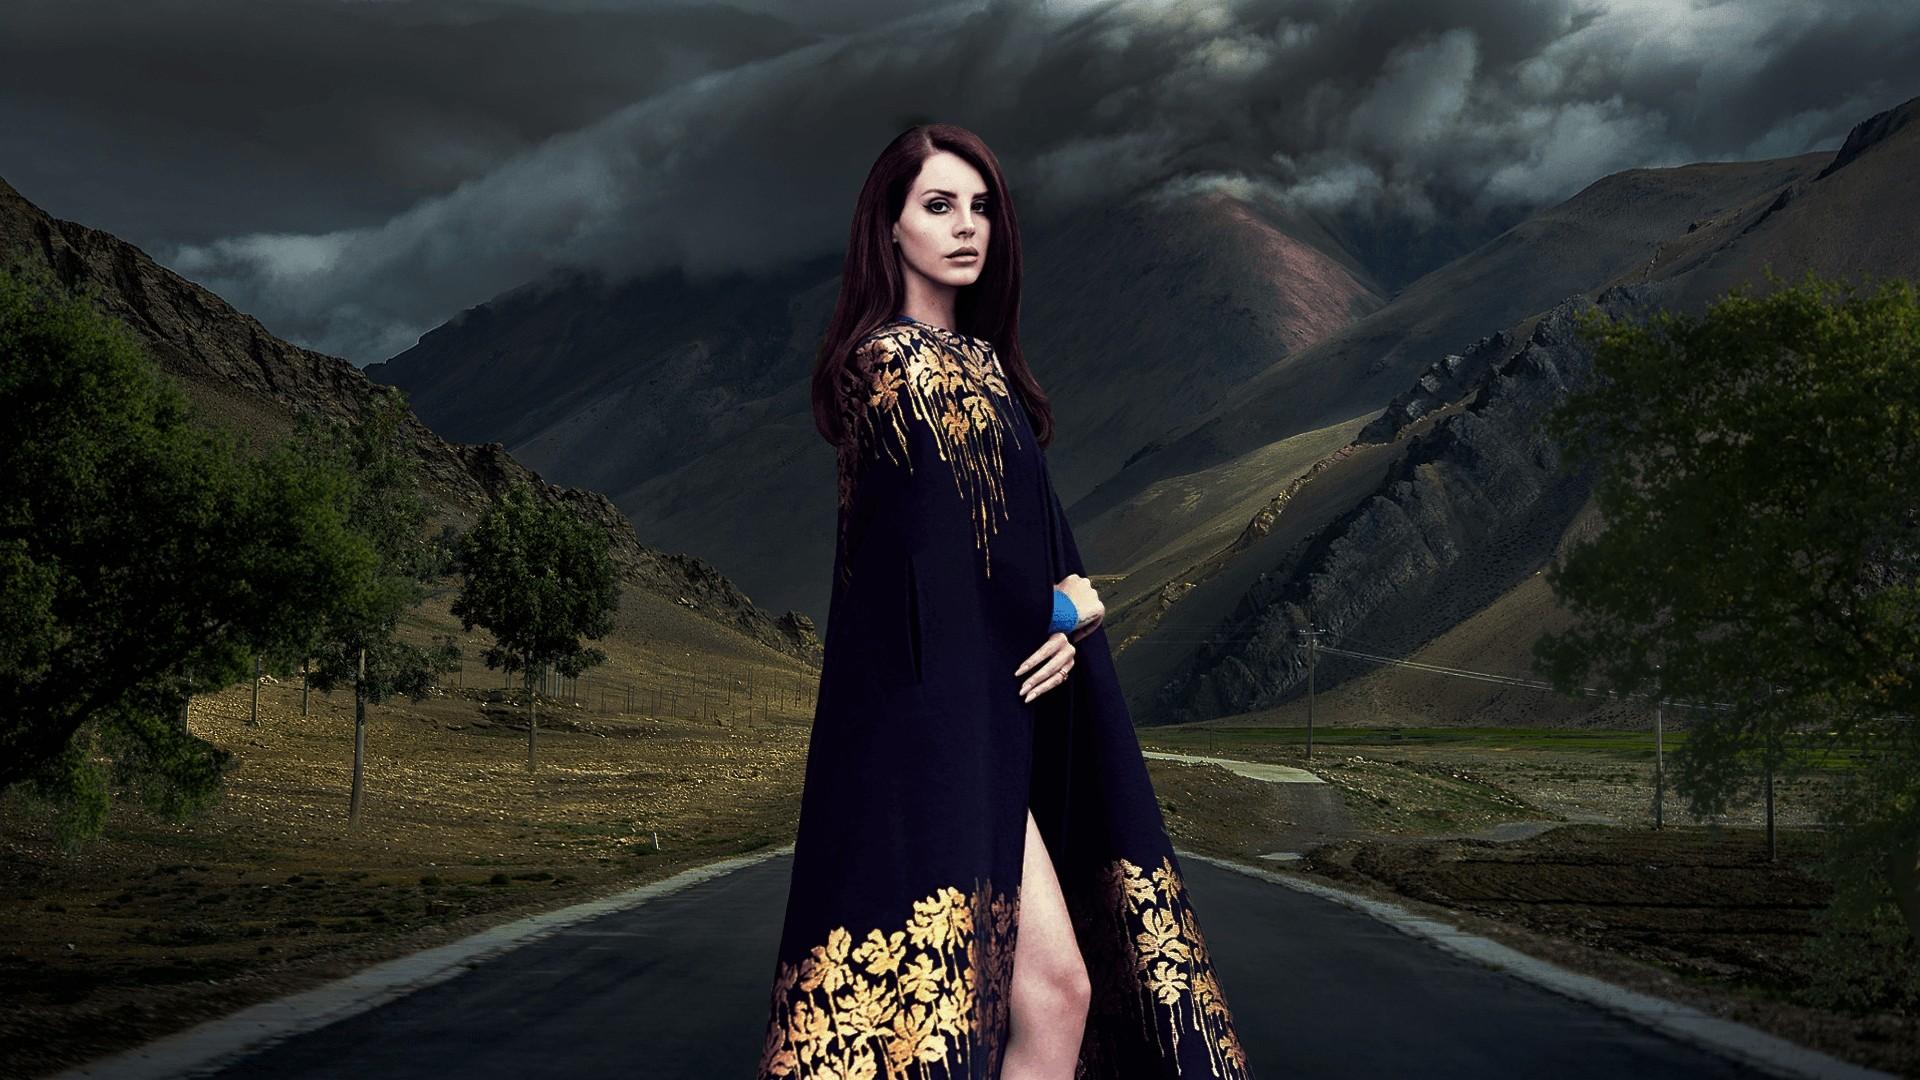 Lana Del Rey hd wallpaper download